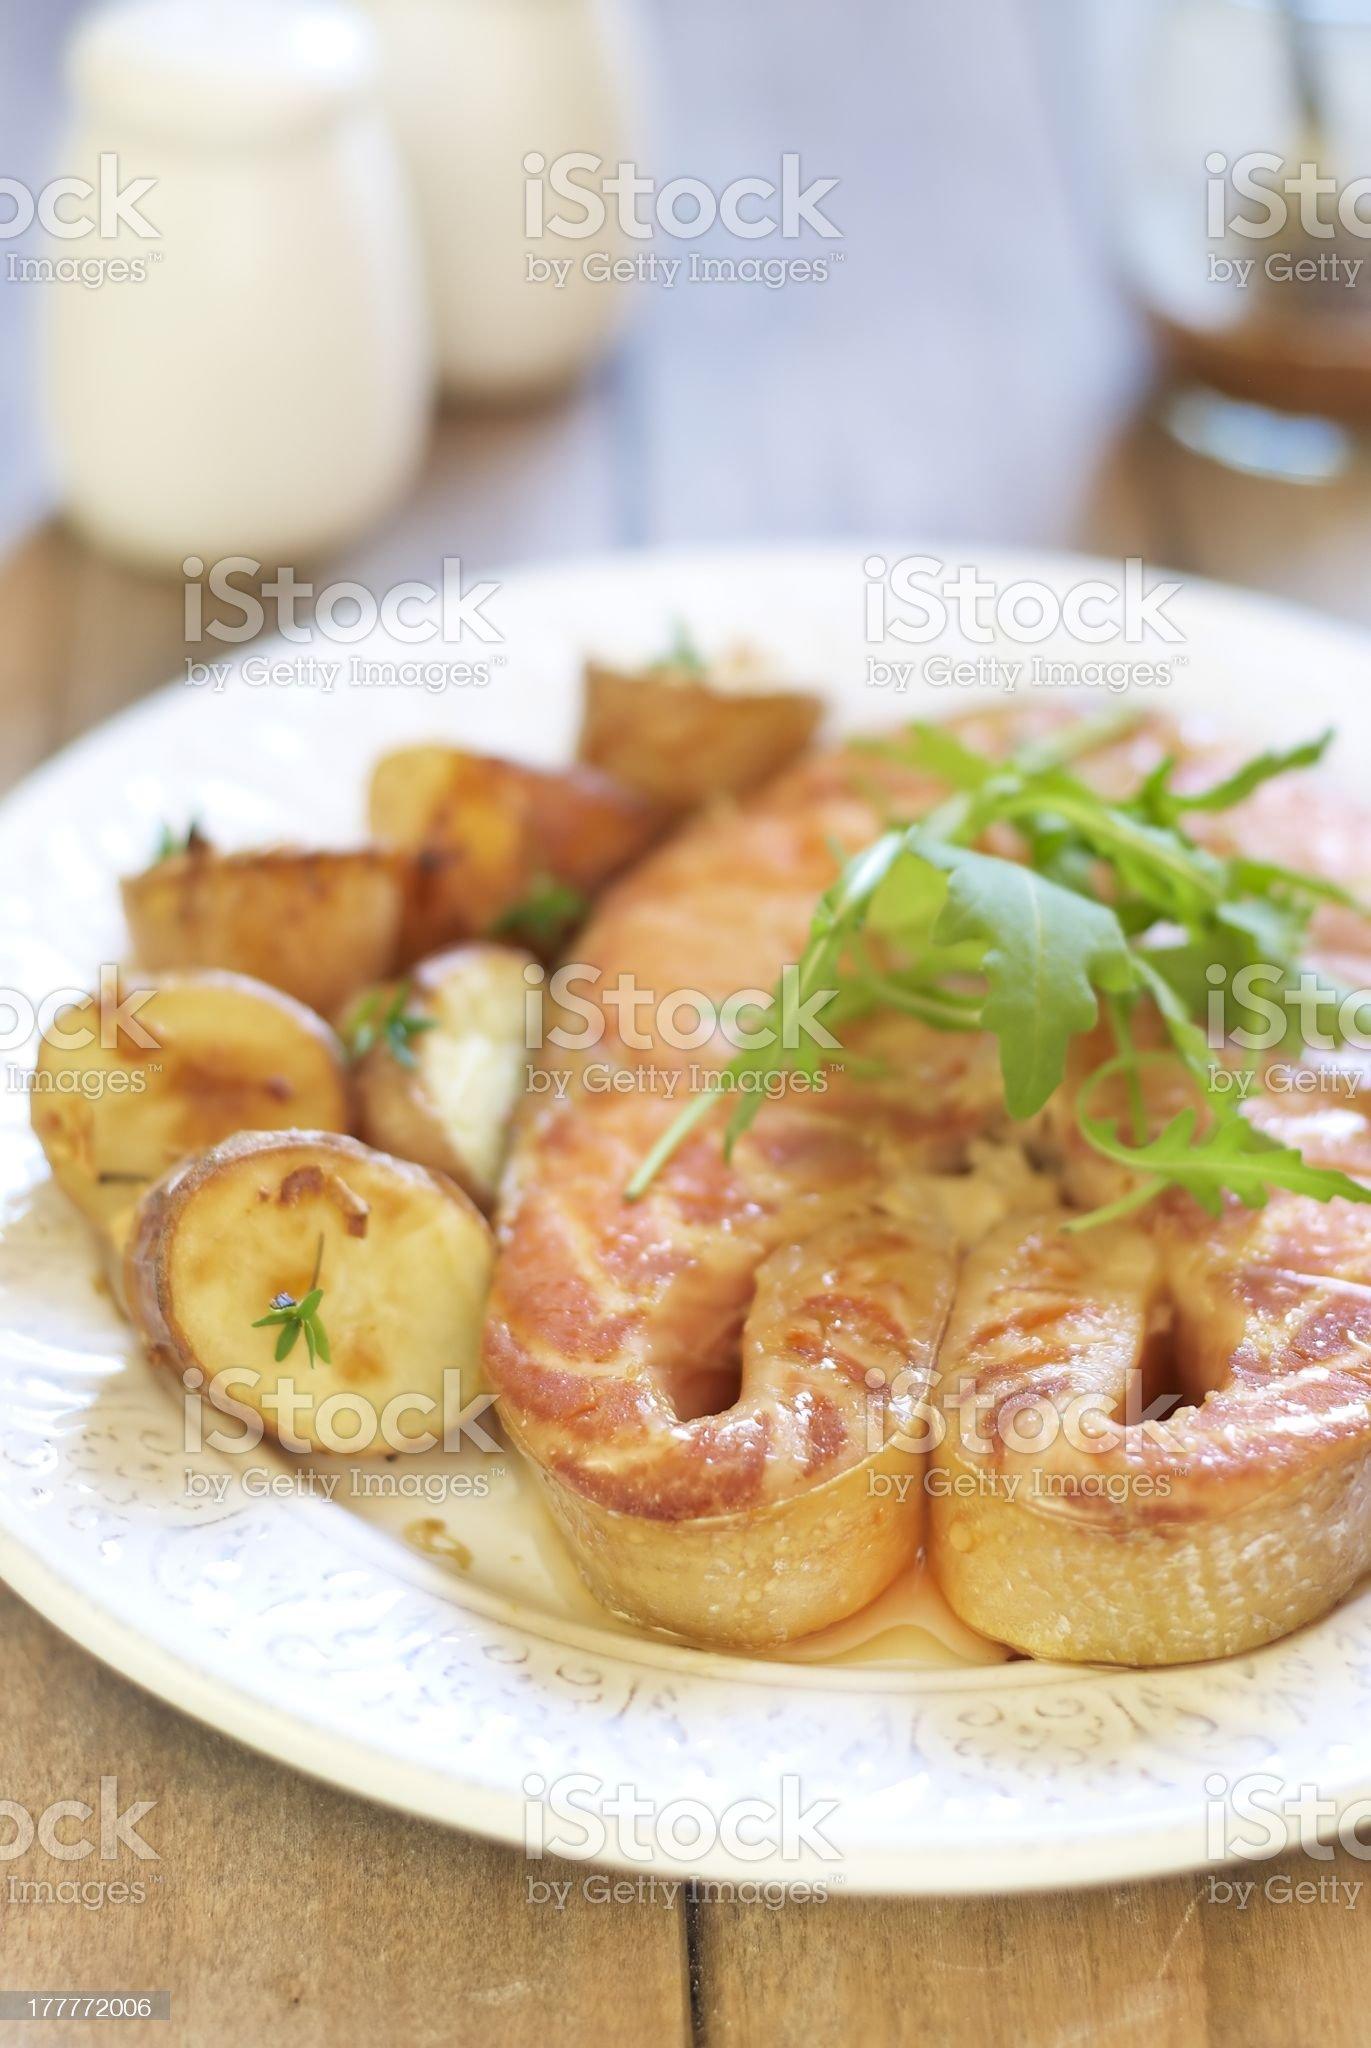 Baked salmon steak with potato and arugula royalty-free stock photo